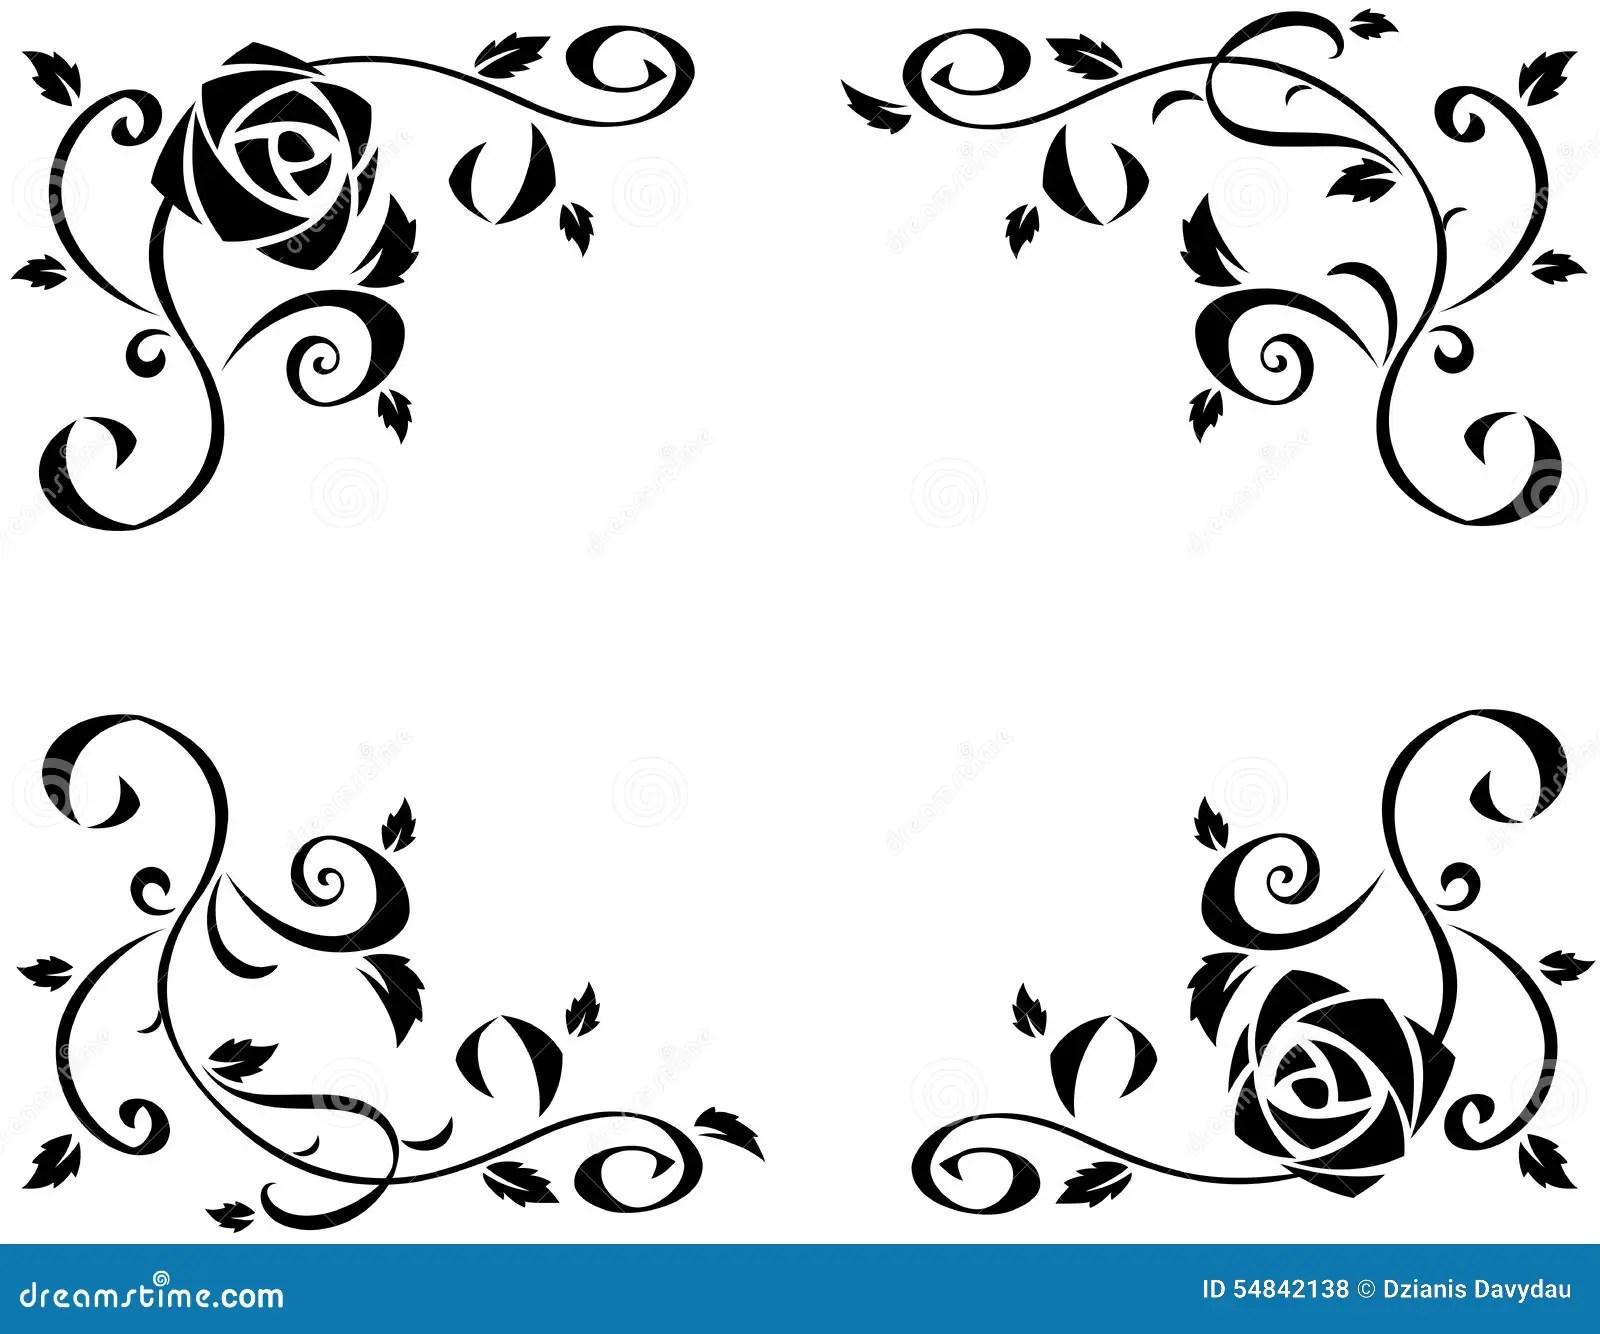 Elegant Black And White Floral Borders